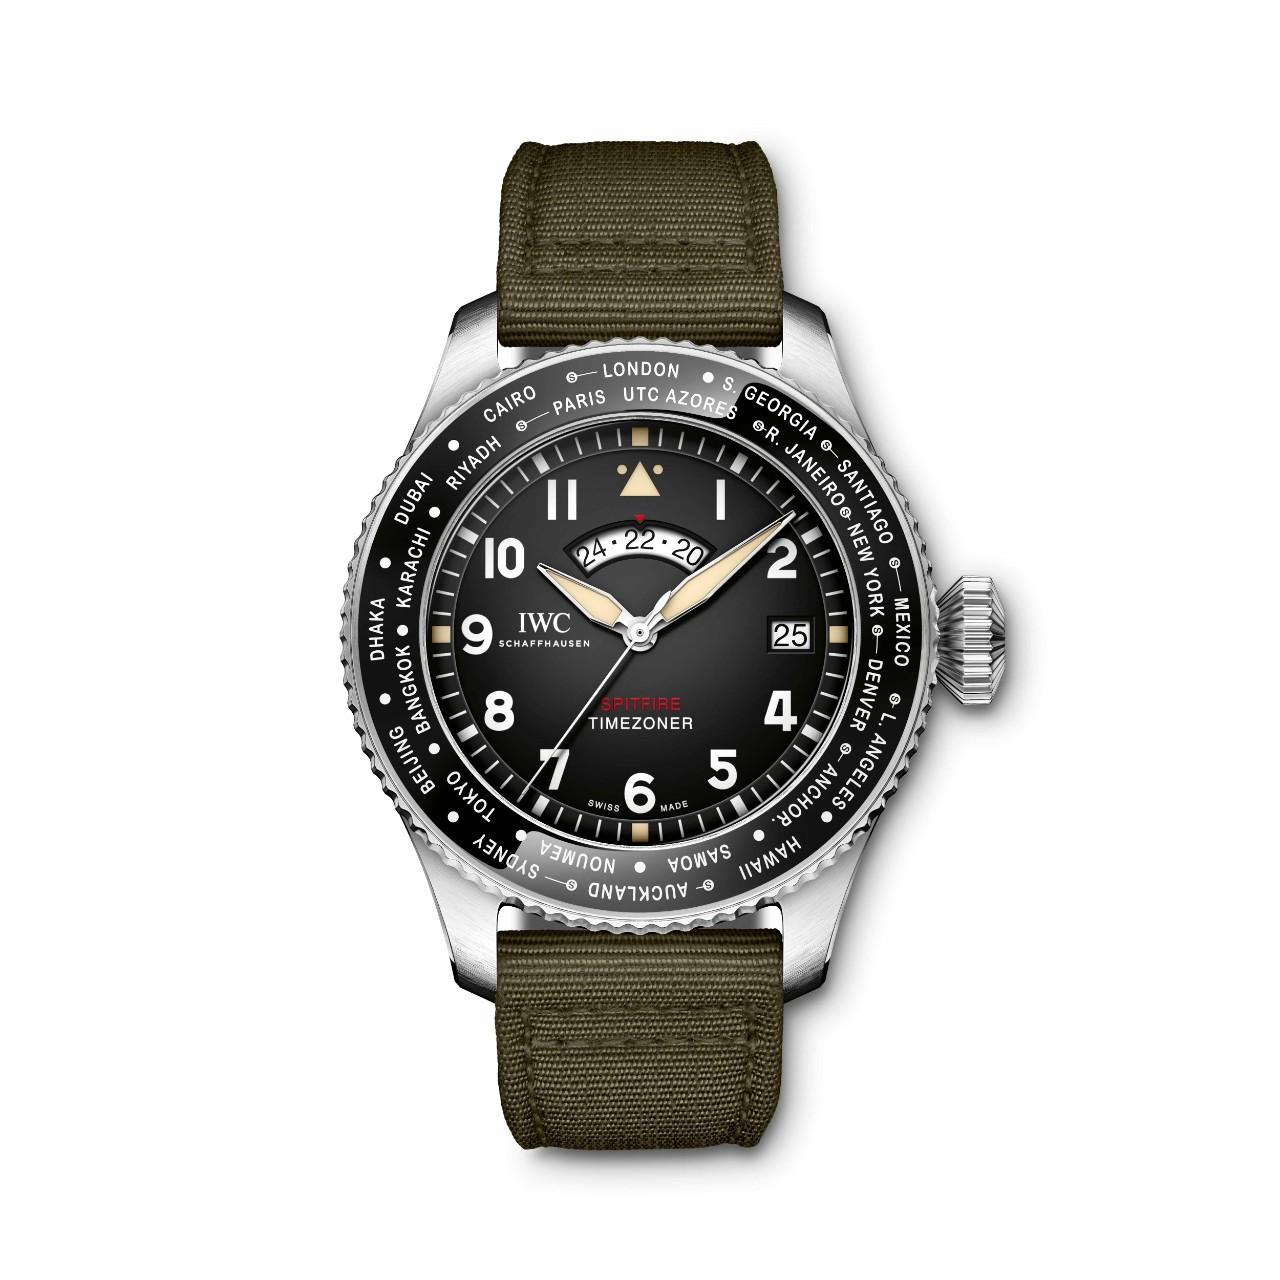 IWC Pilot's Watch Spitfire Edition Timezoner